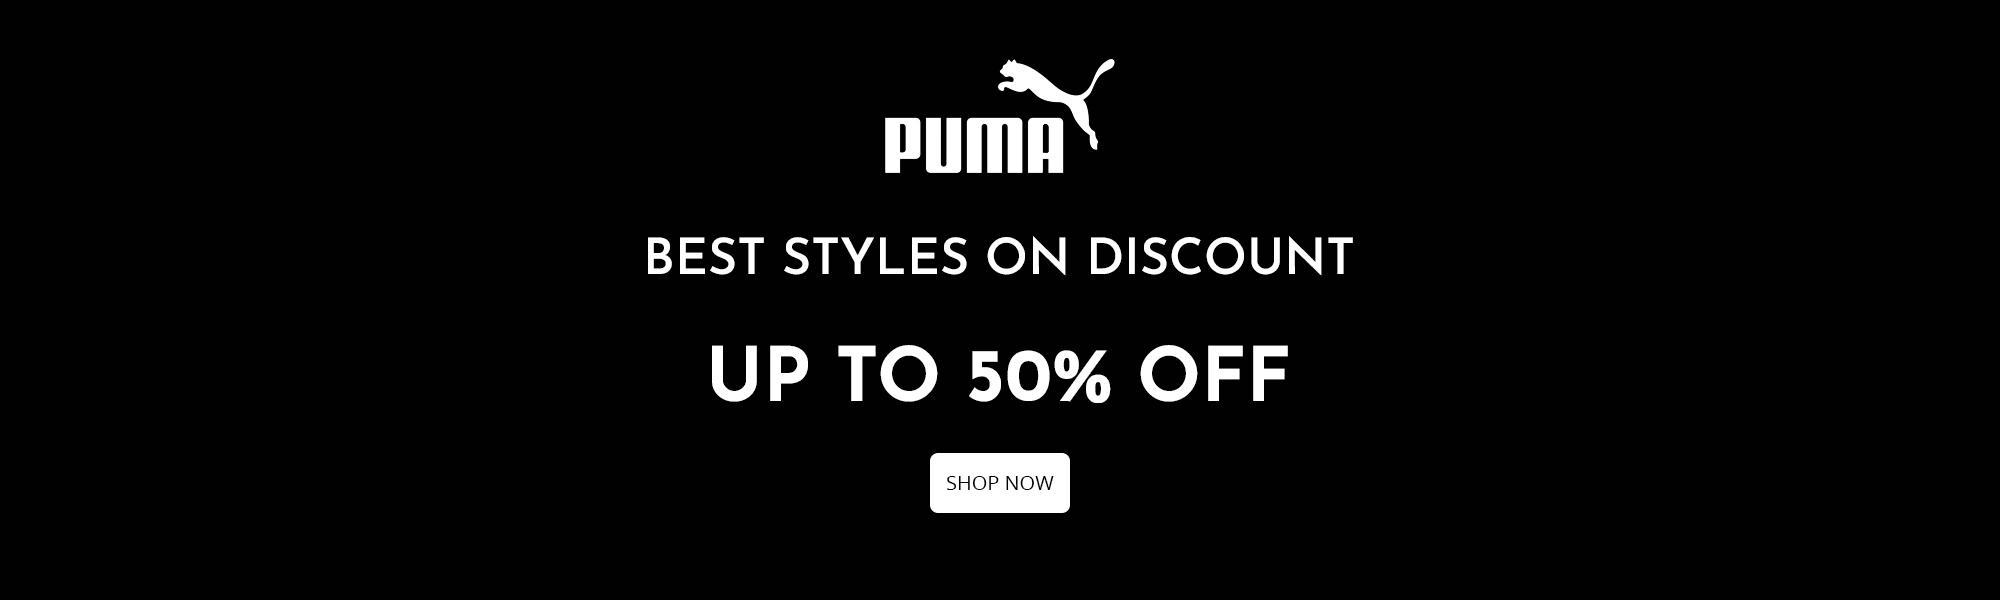 Puma-Brand-Best-Style-Discount-Static-Web.jpg